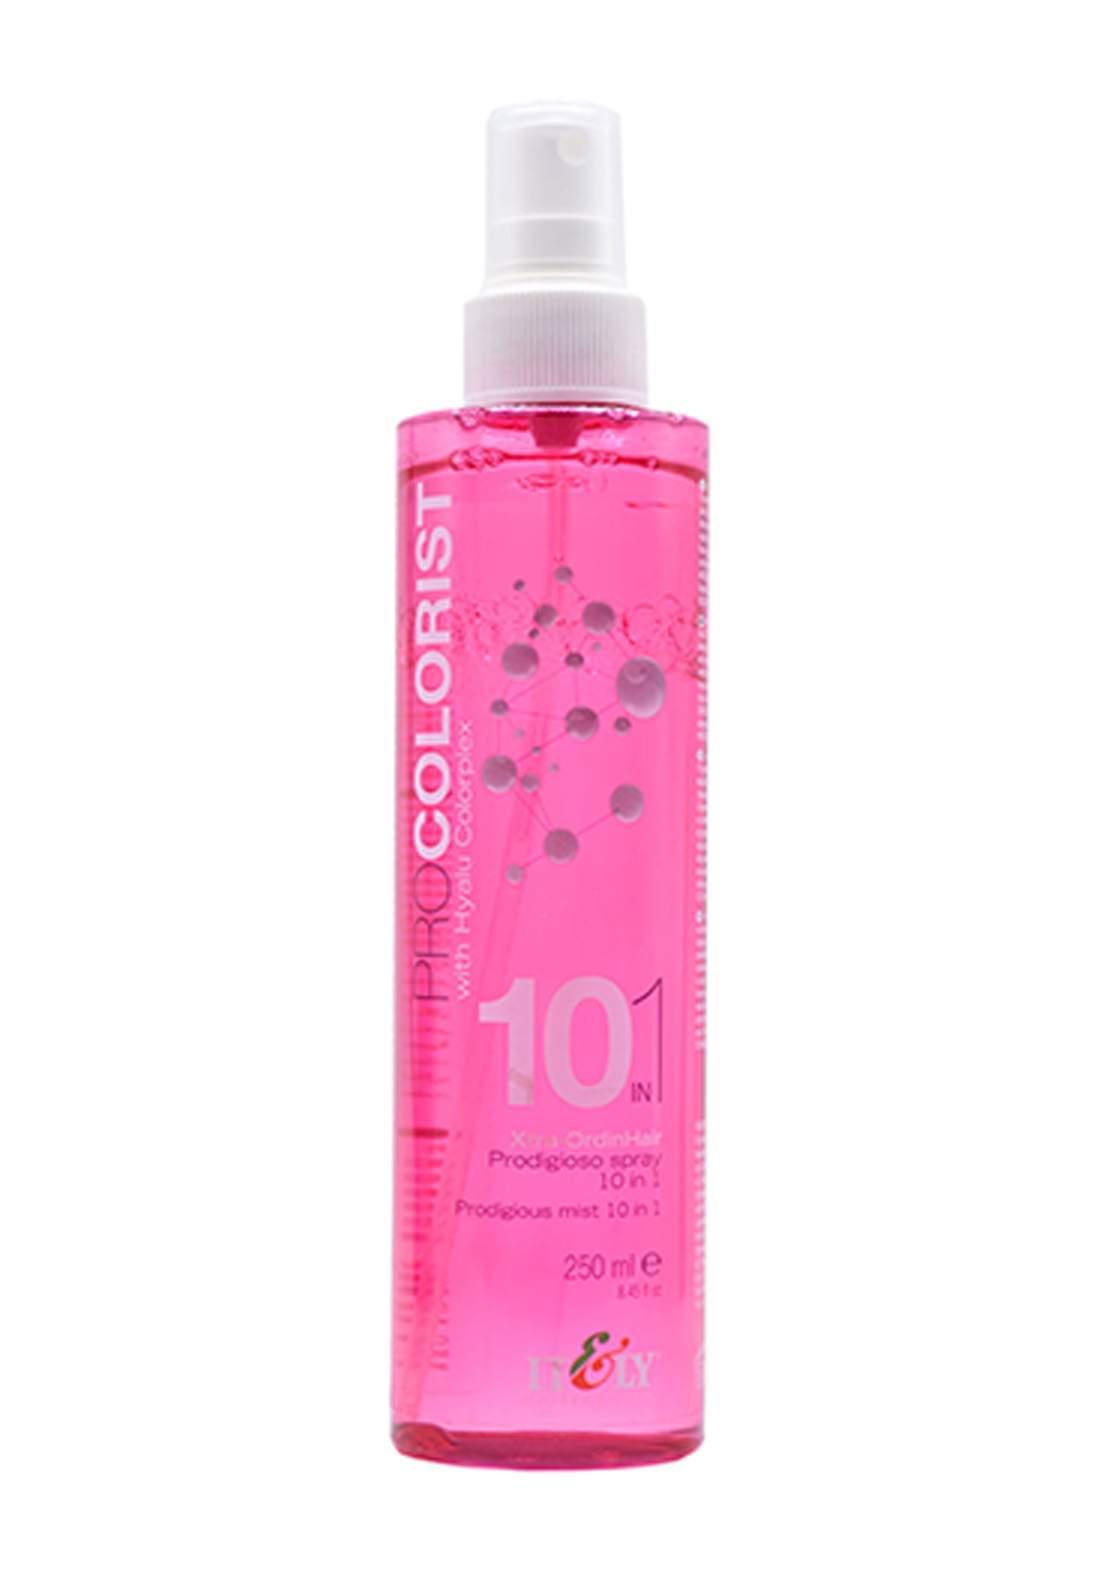 Itely Pro Colorist Xtra Ordinhair 10 in 1 Spray 250ml بخاخ حماية لون الشعر